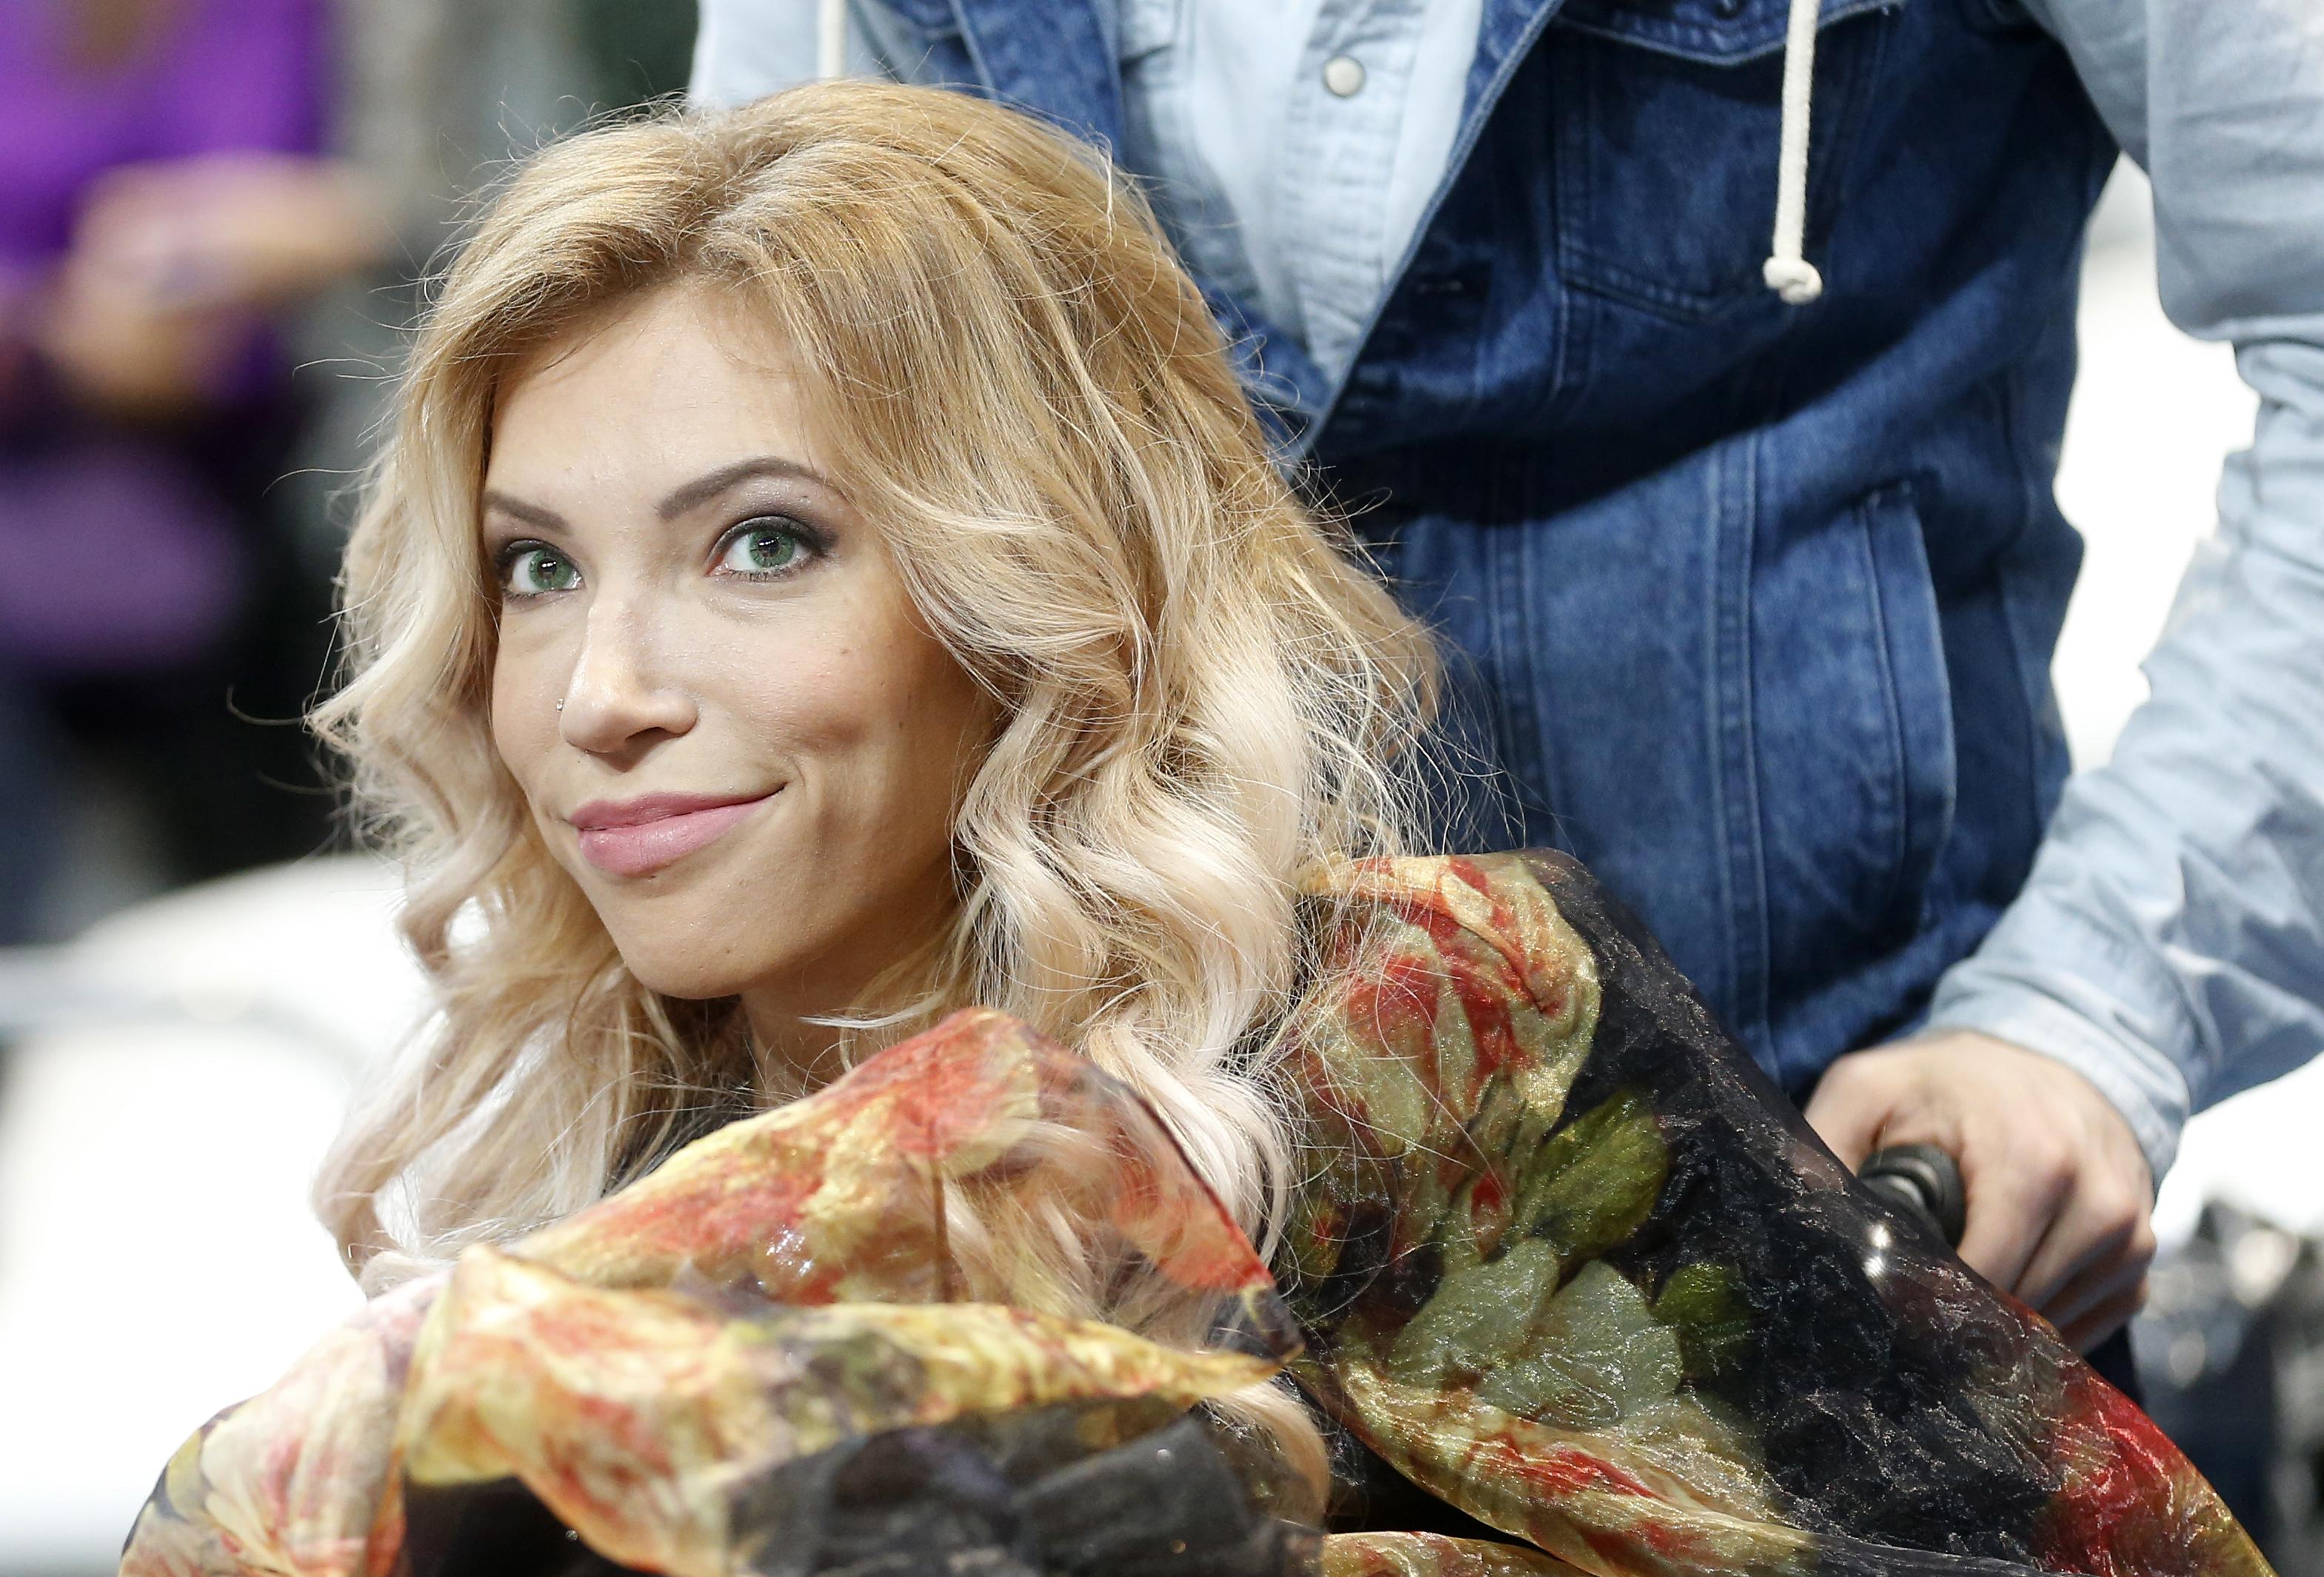 Yulia Samoylova (C) EPA/MAXIM SHIPENKOV